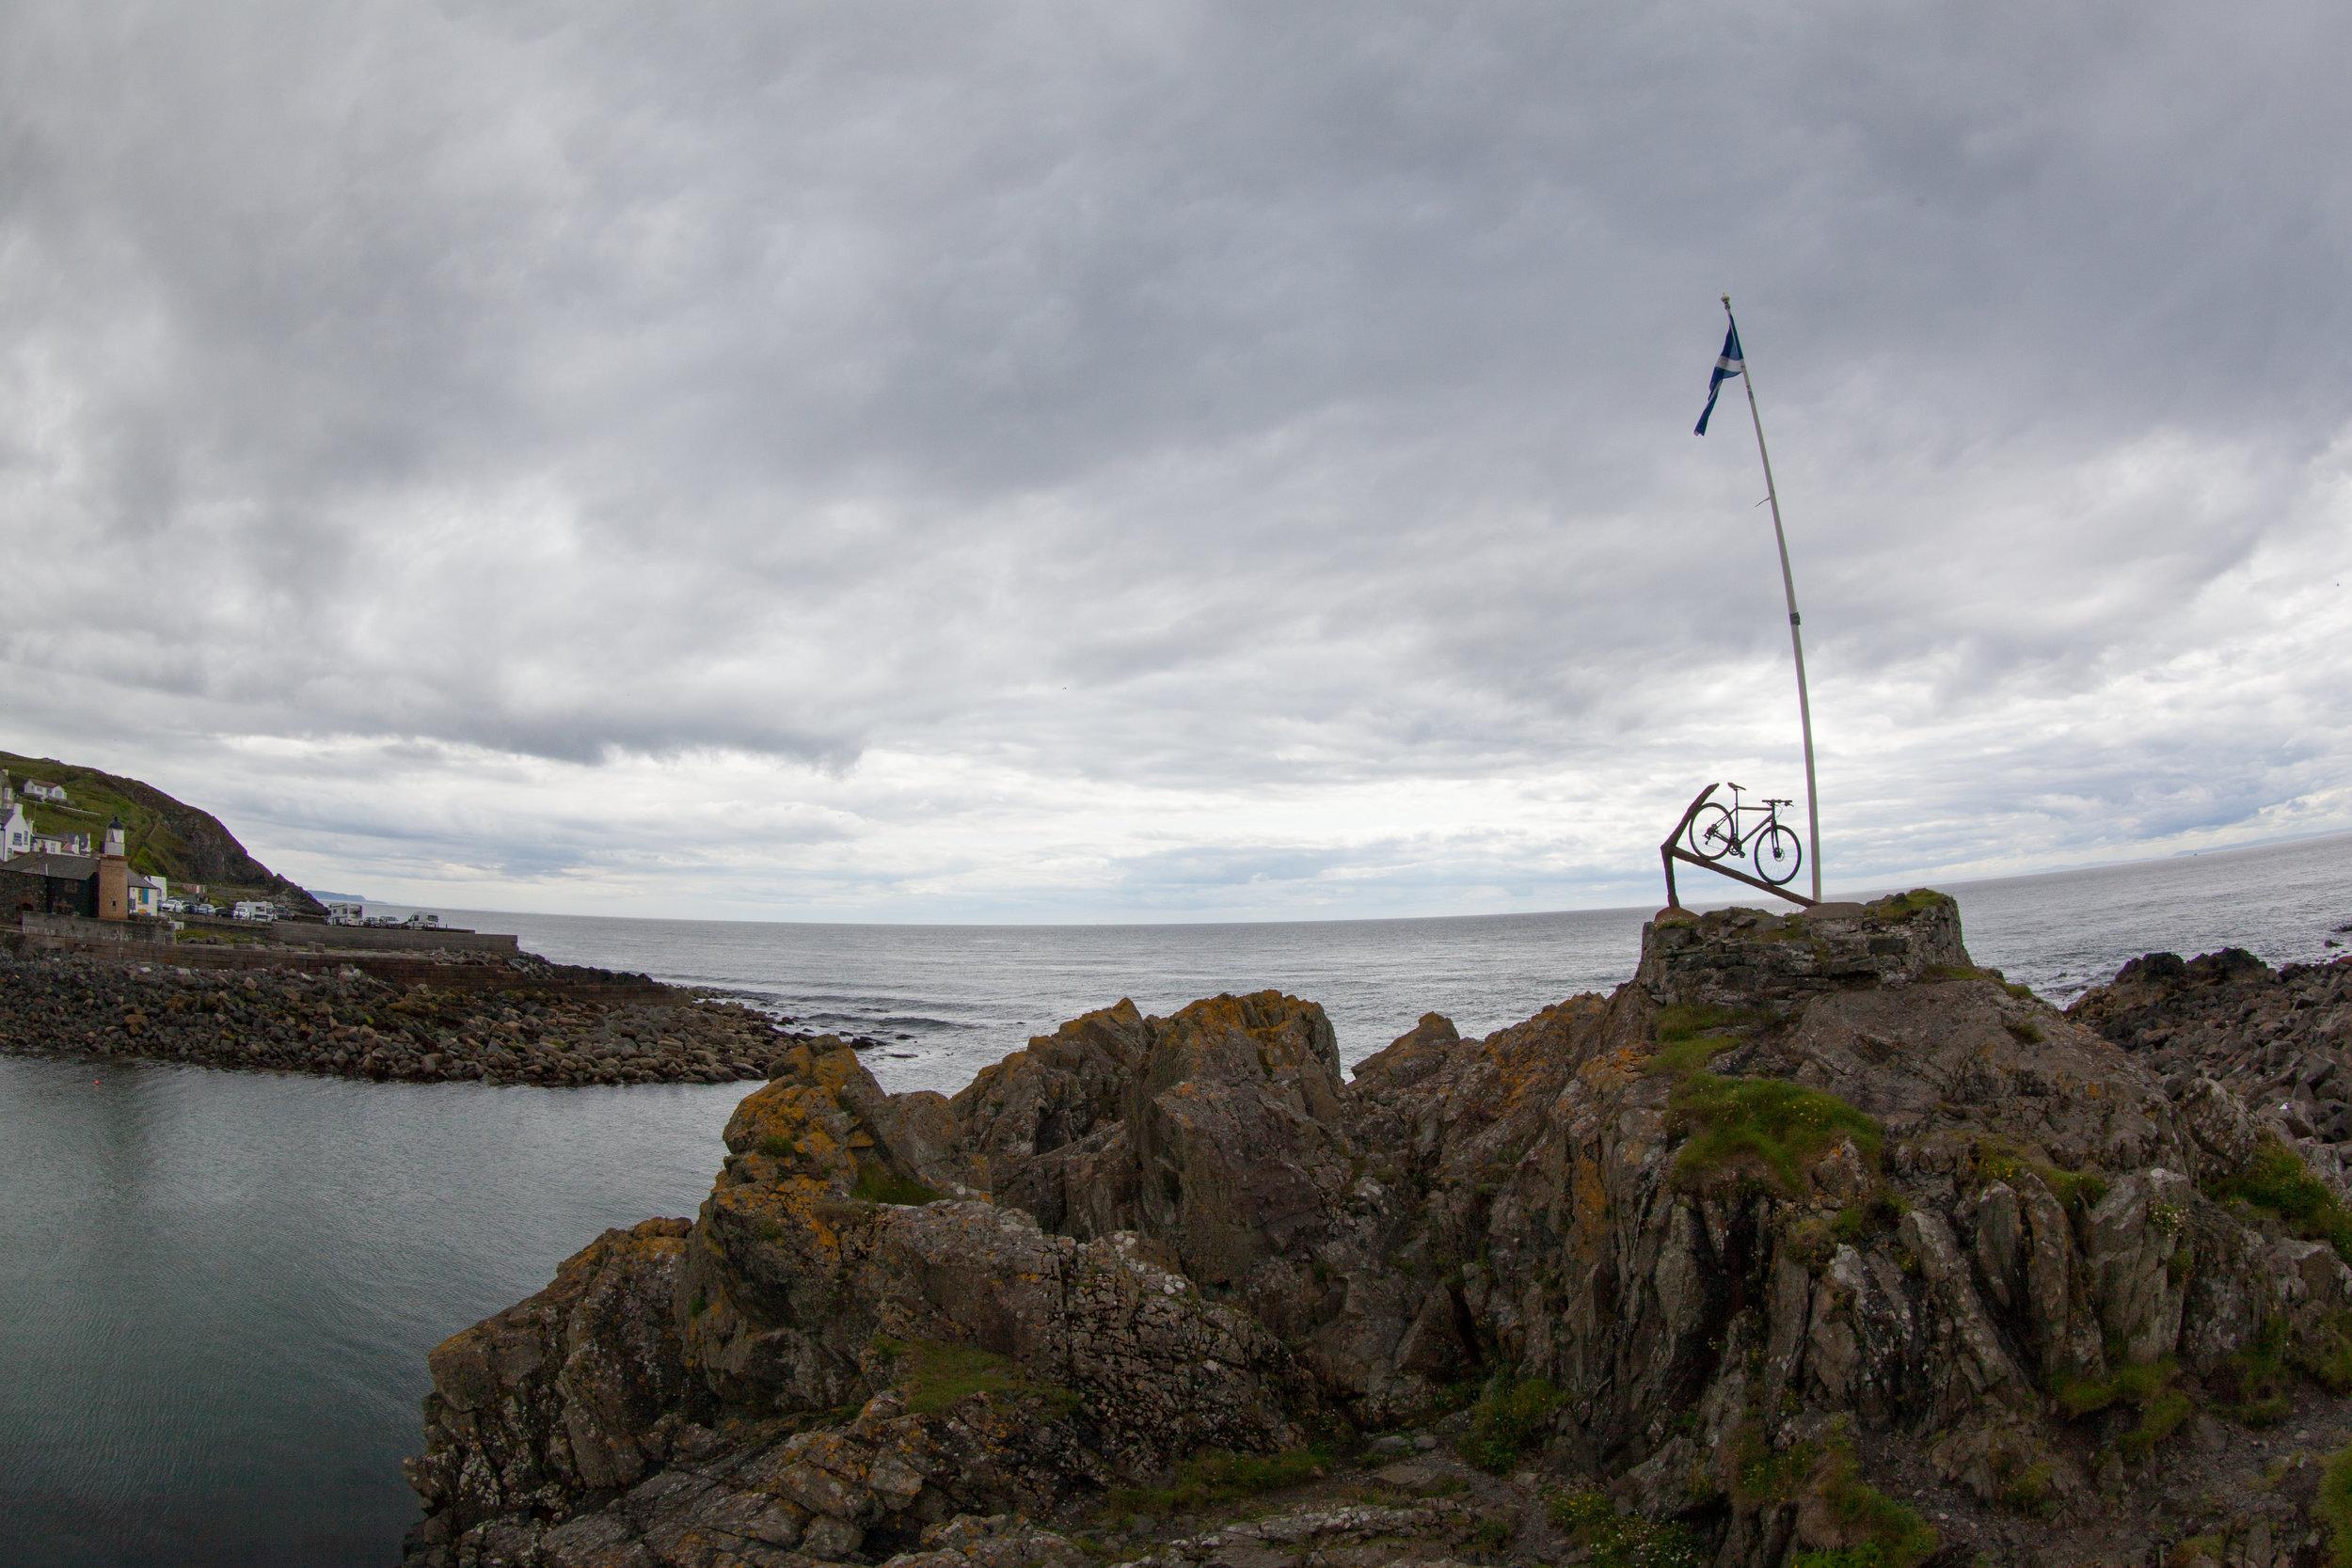 A rocky outcrop on the coastline of Scotland.